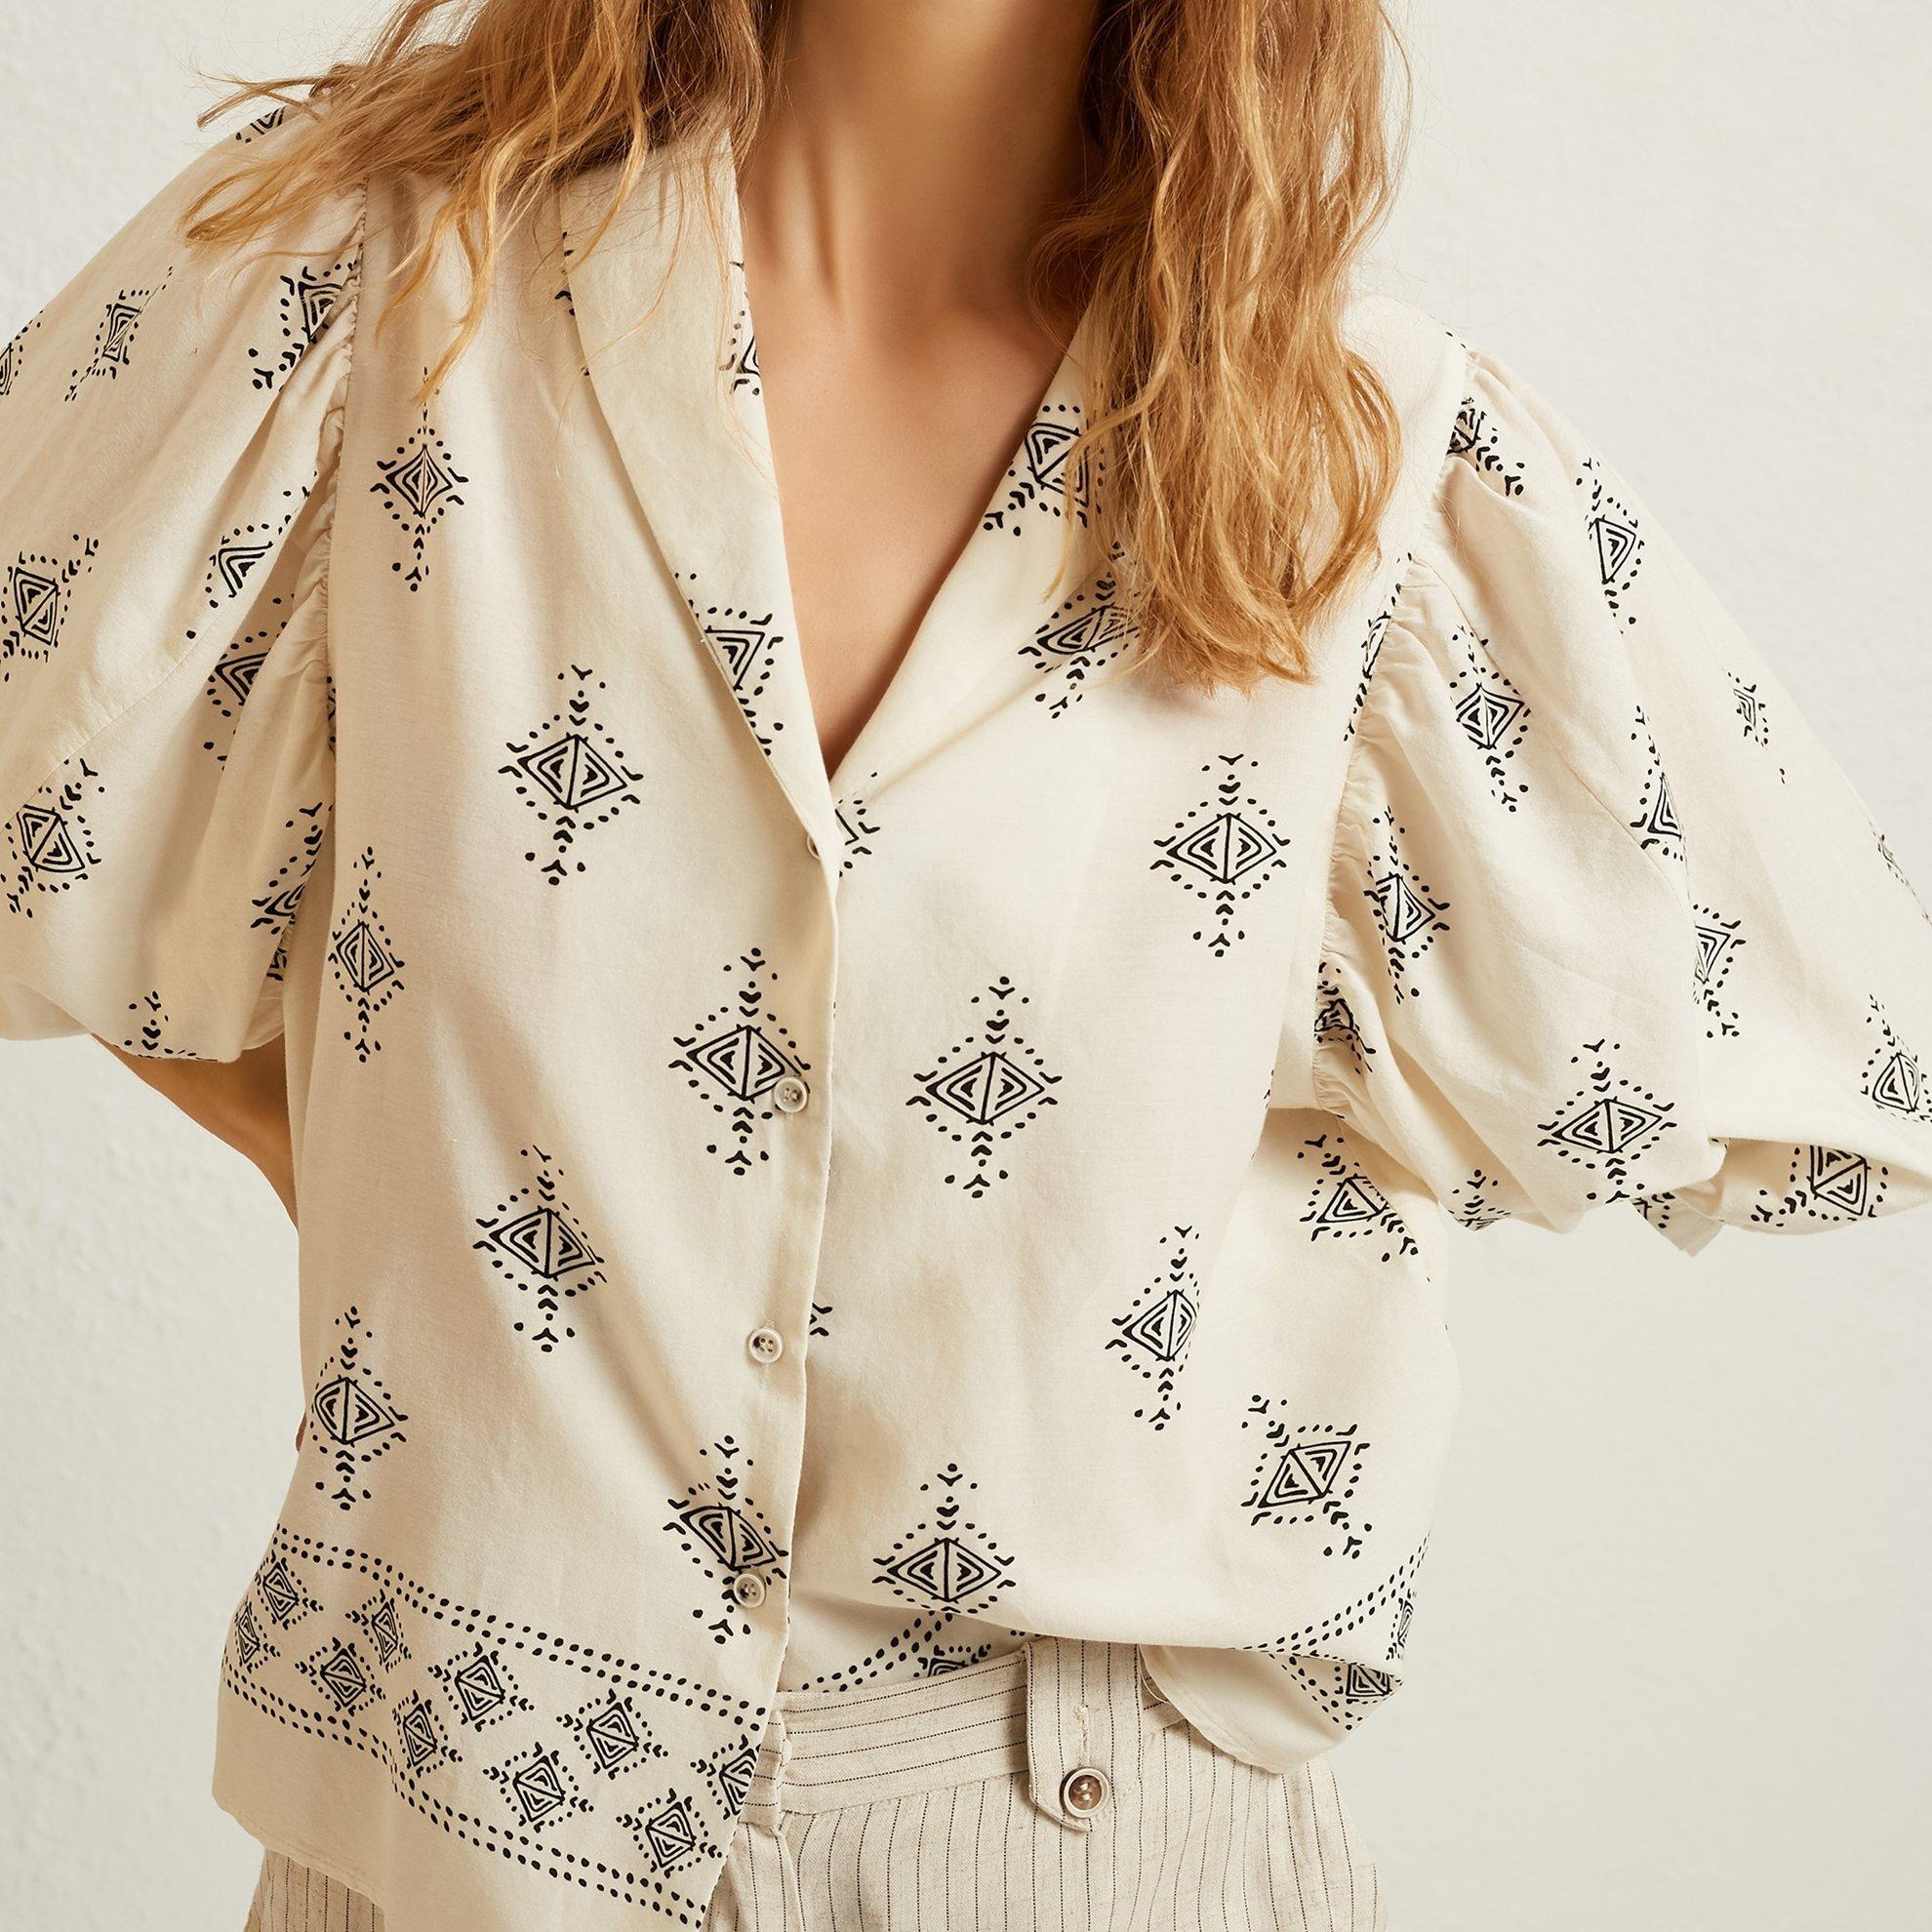 Sleeve Detail Shirt